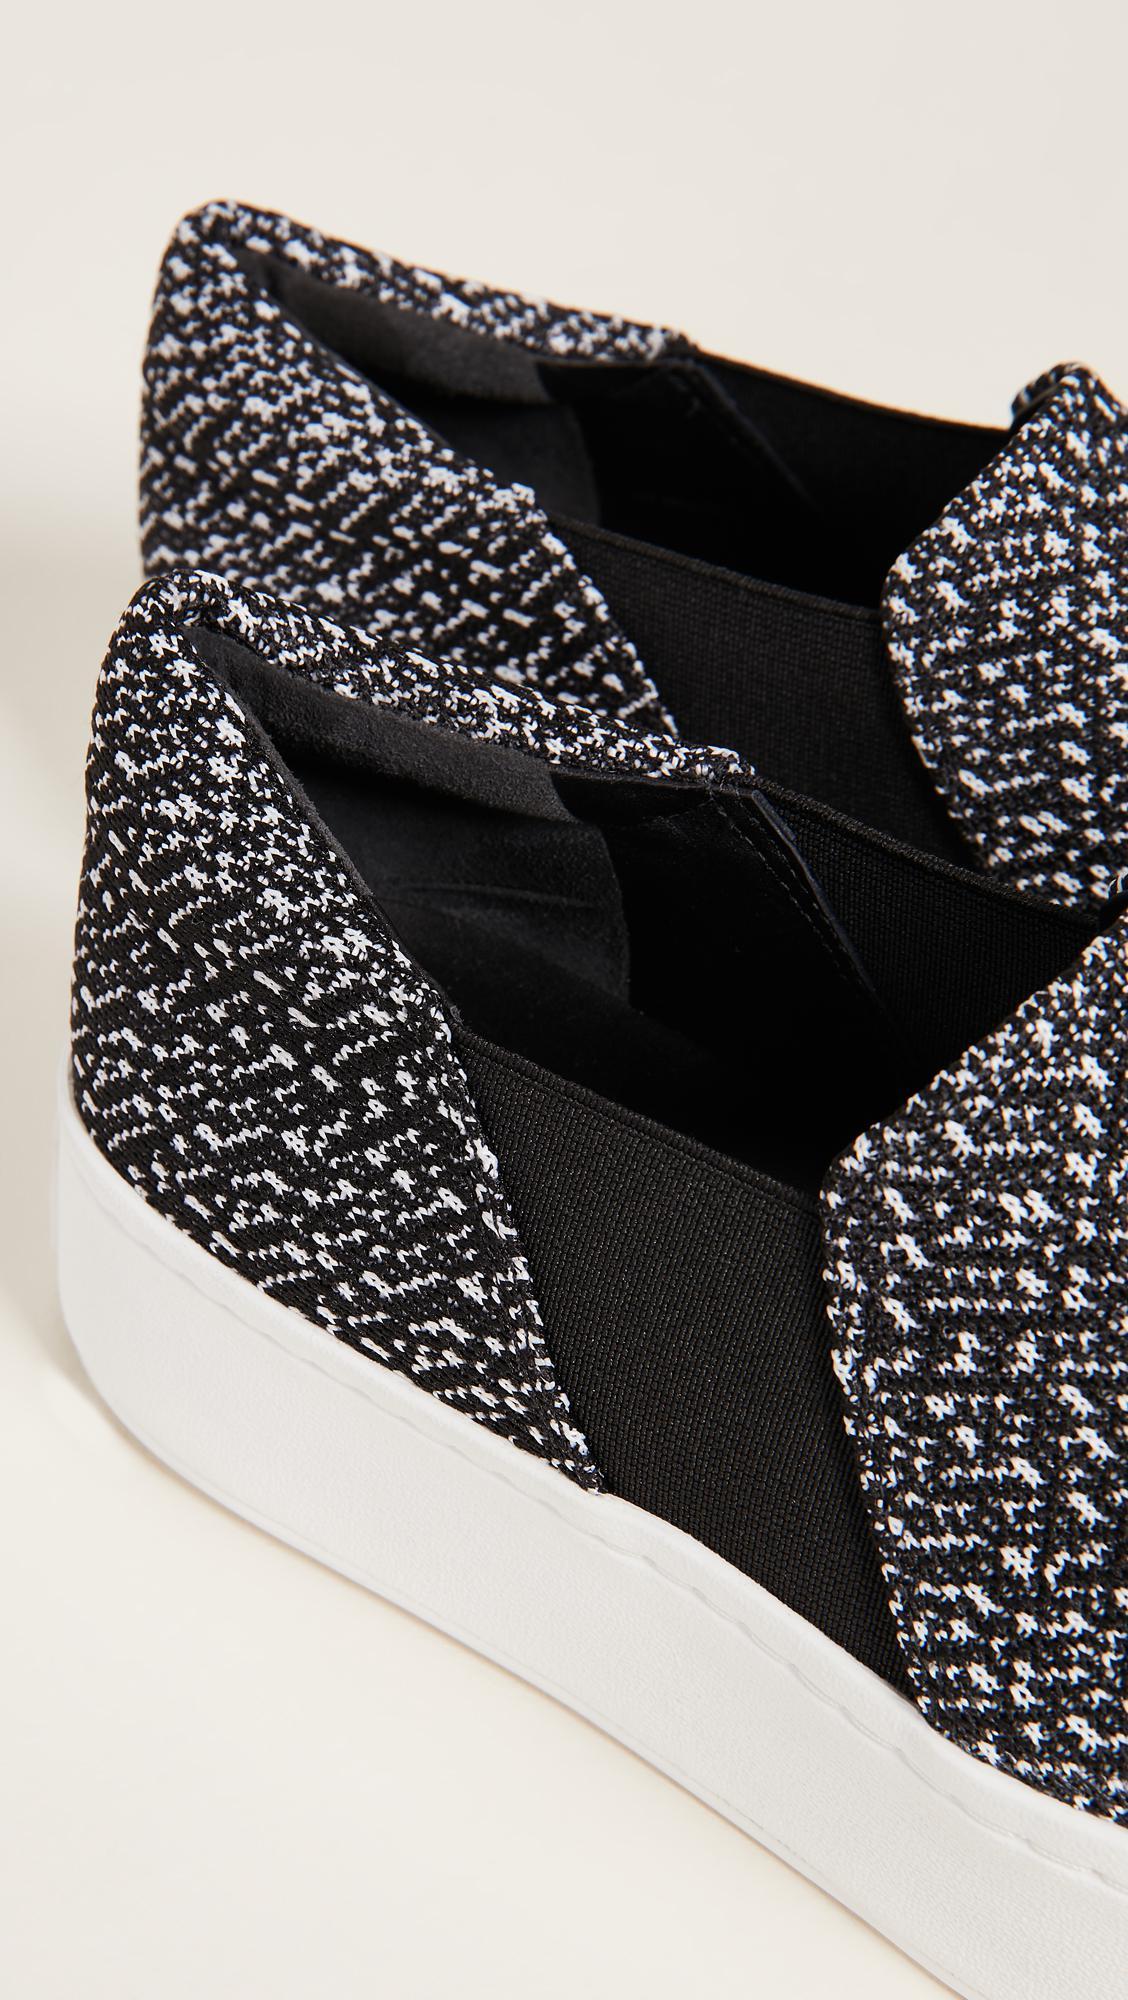 Vince Warren Slip On Sneakers in Black/White (Black)